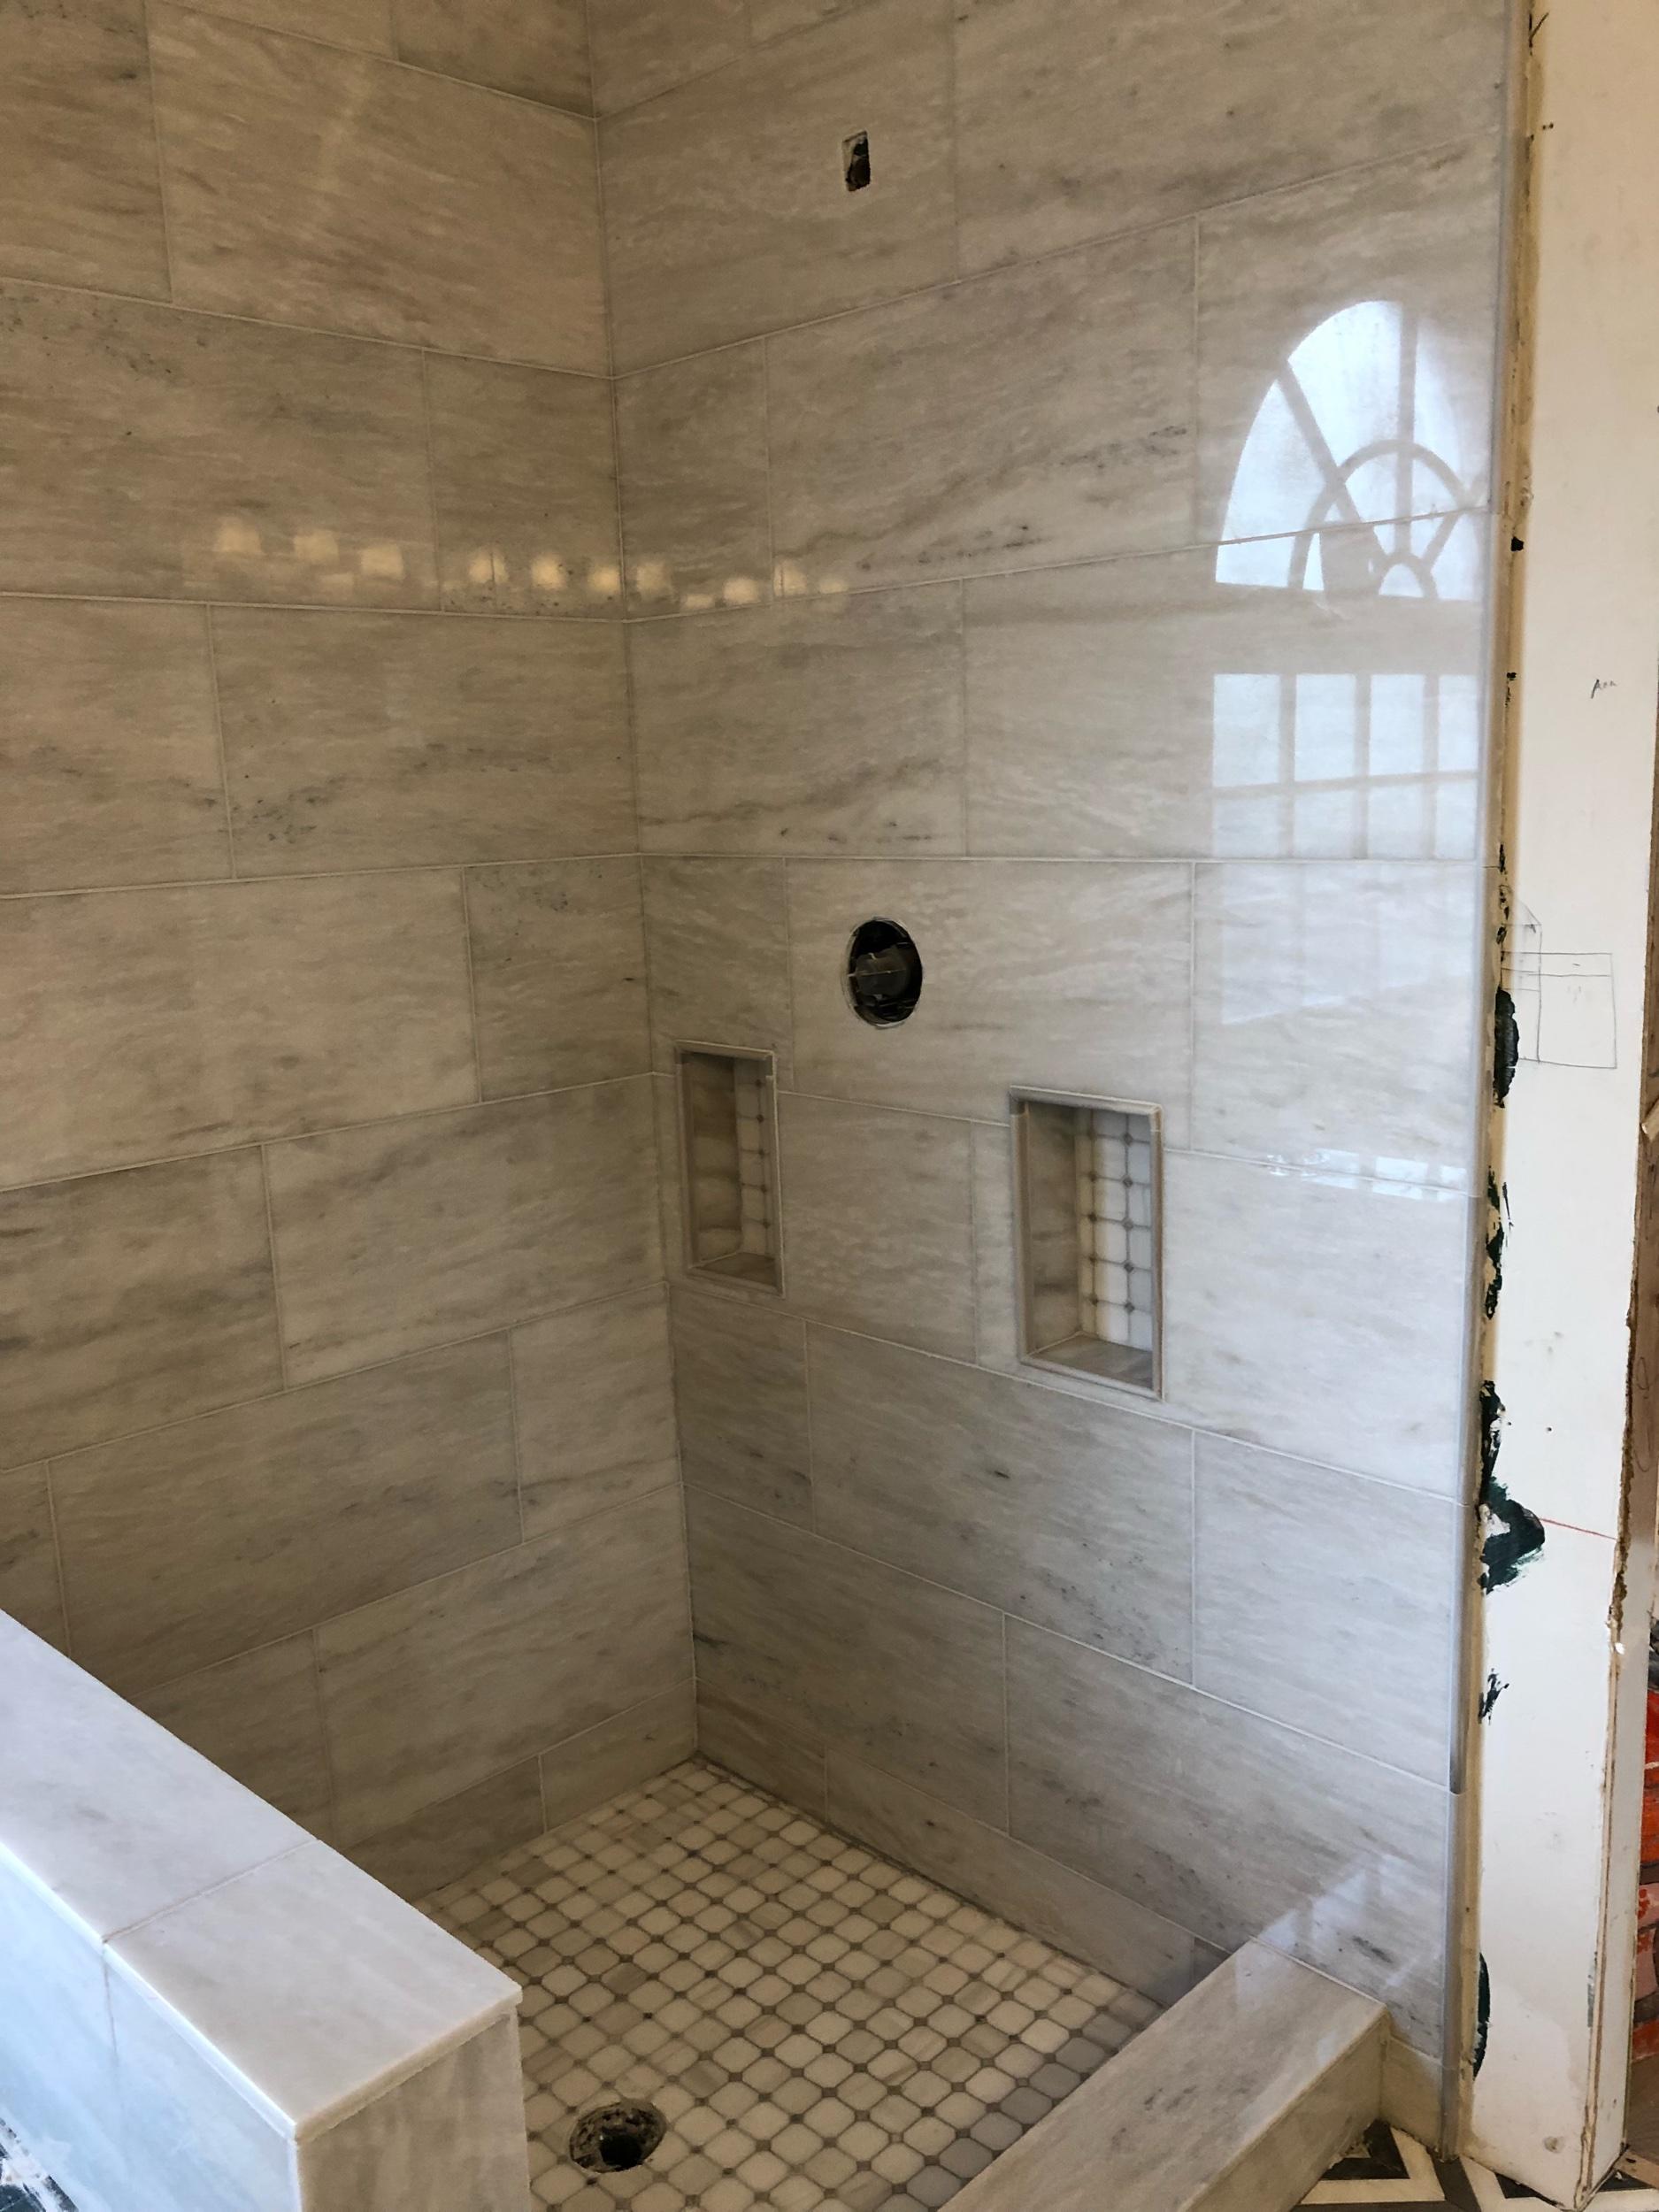 Professional Tile Installation - Marble custom Installer, bath, showers, walls, floors, fireplace.